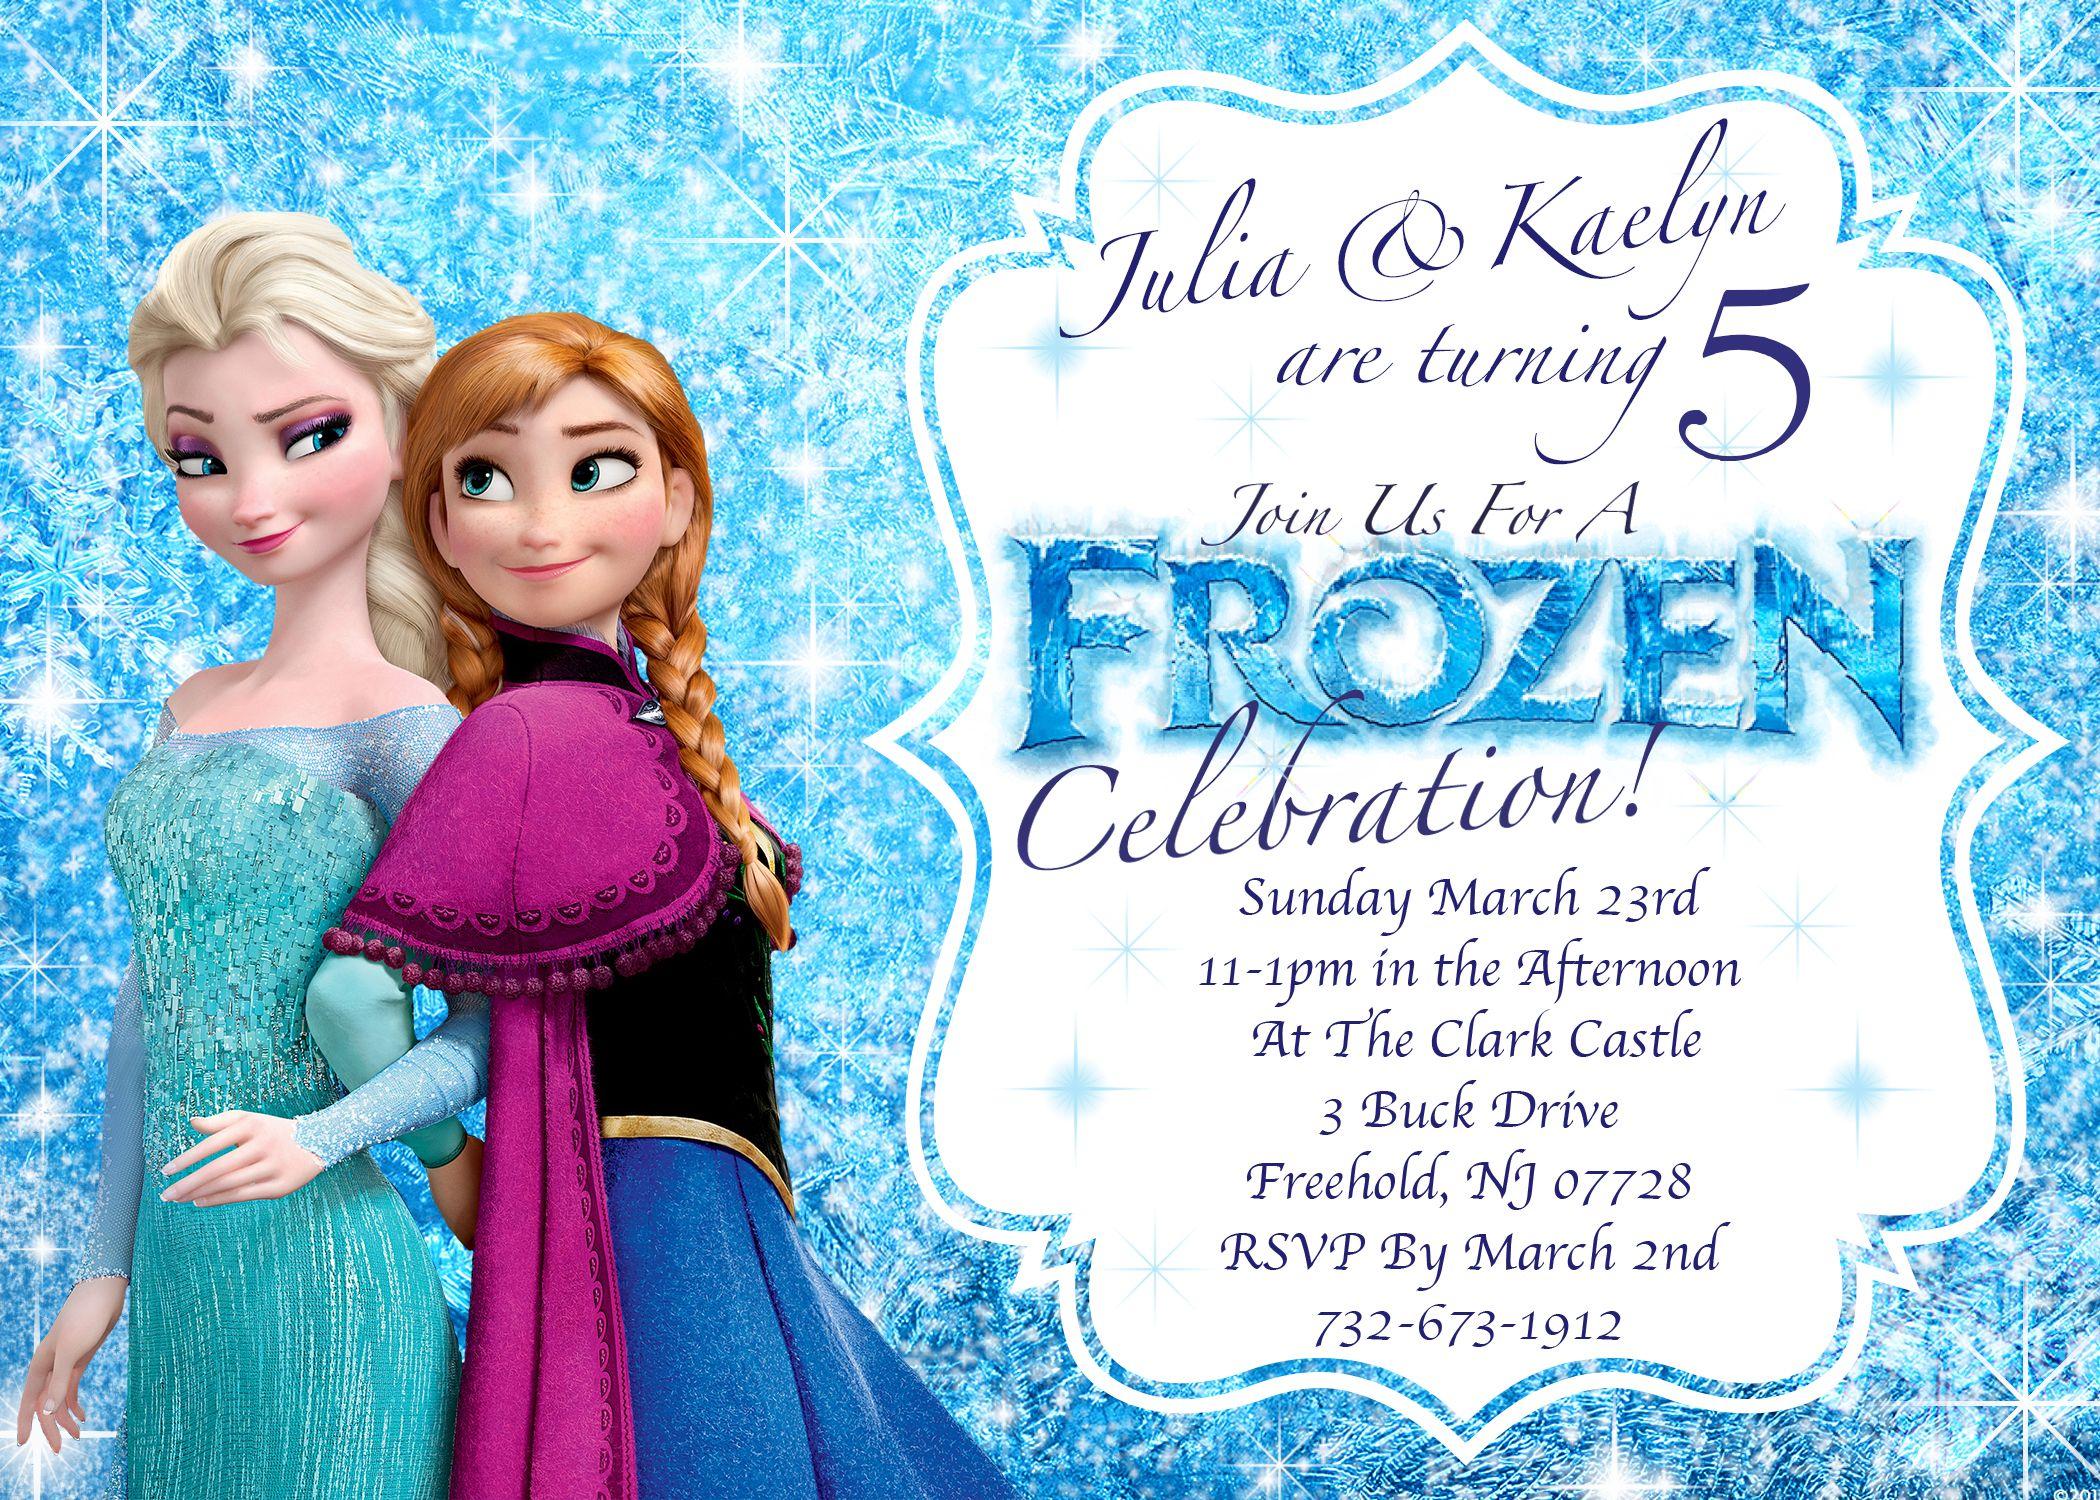 Frozen Olaf Invitations as nice invitations ideas